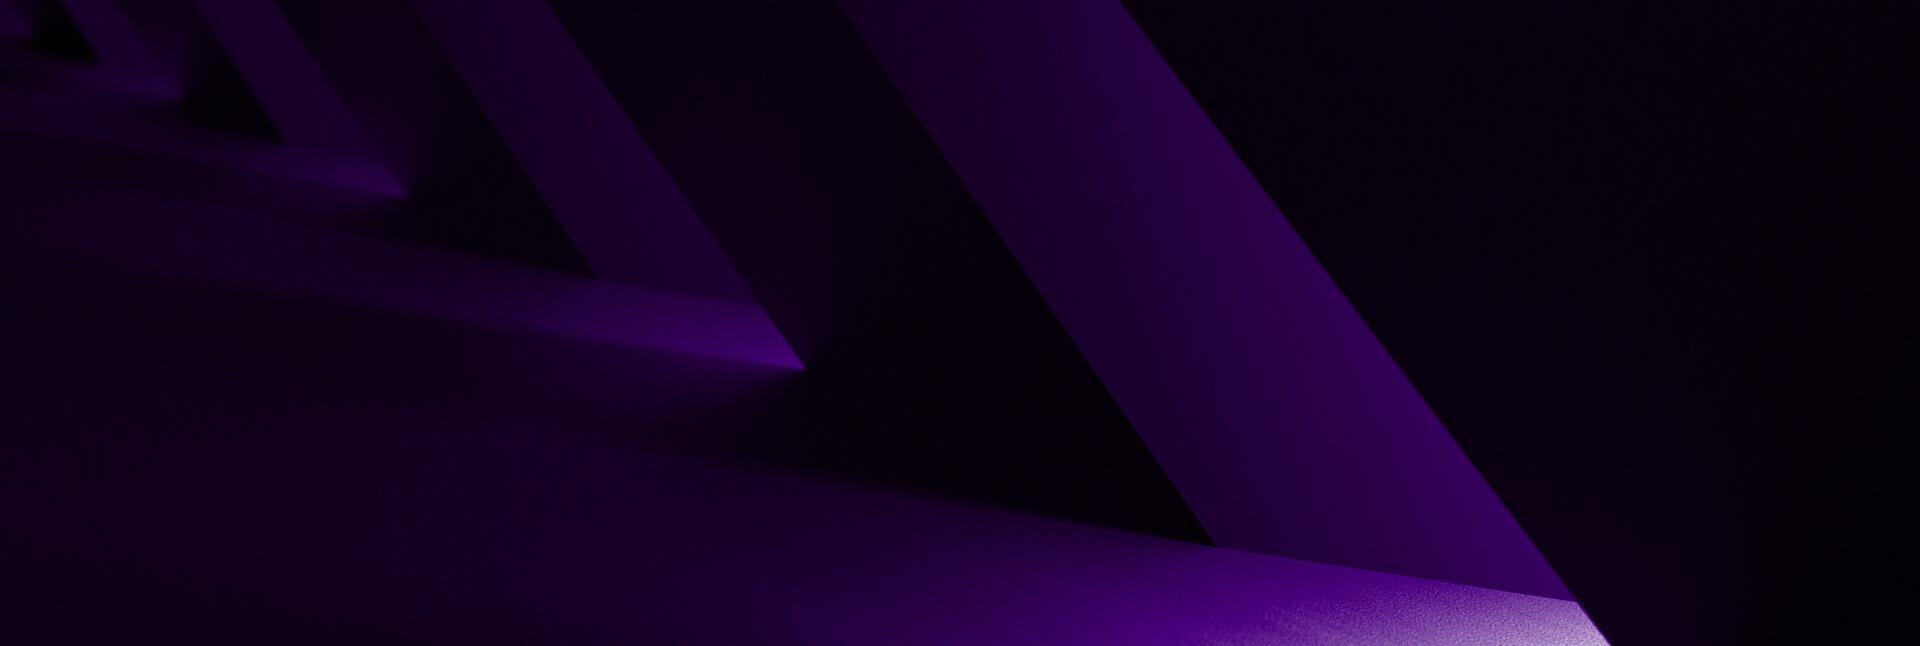 rra-background-purple-1-2018.jpg